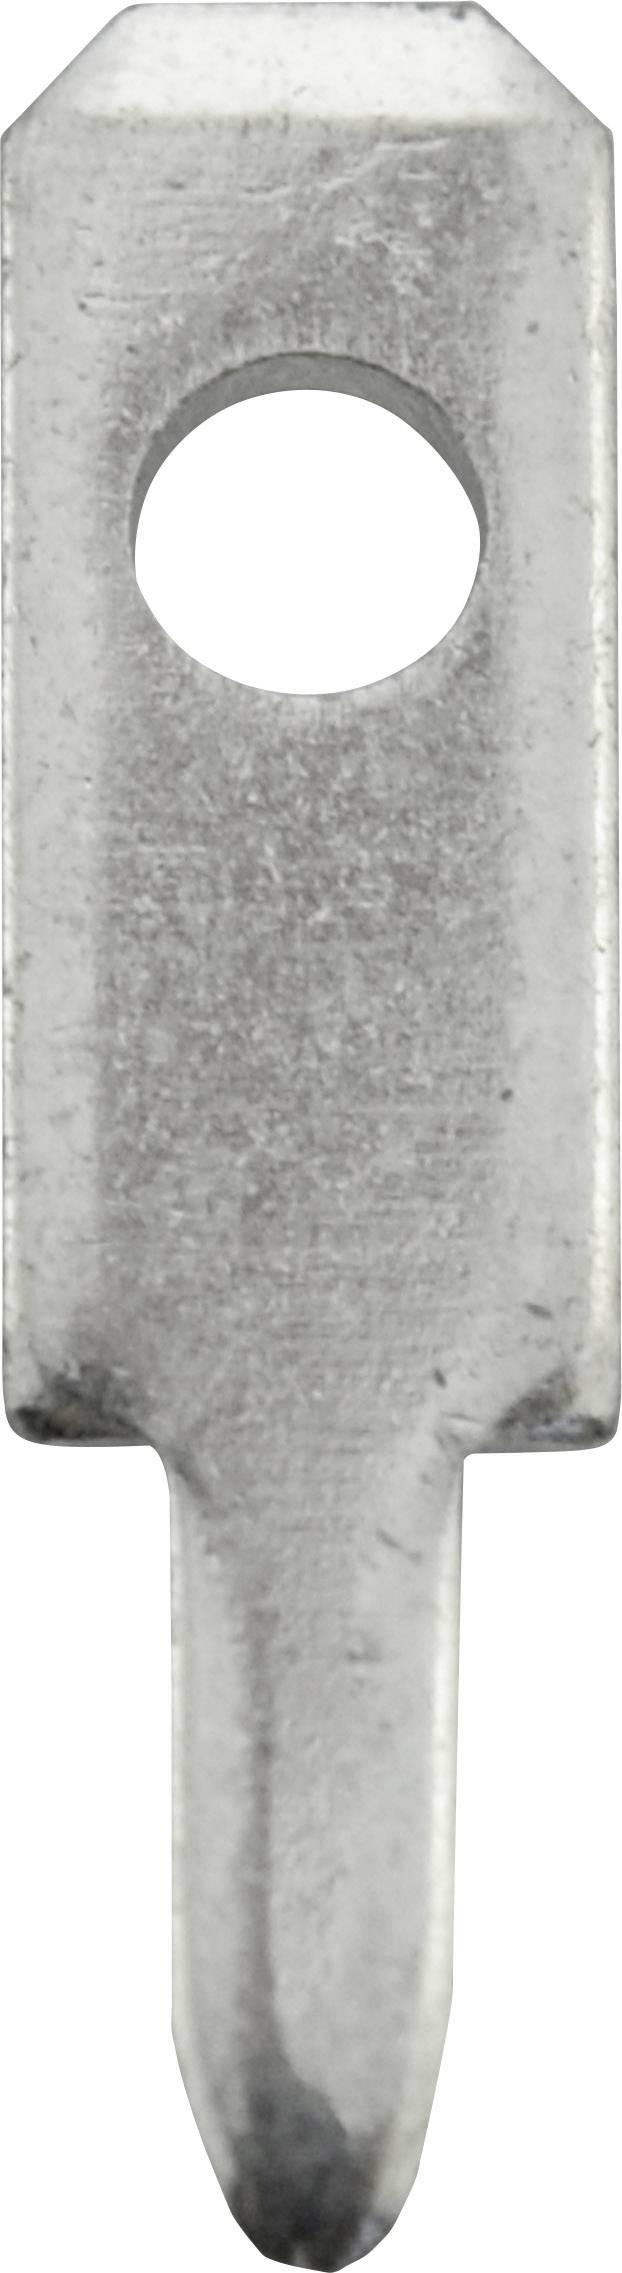 Faston zástrčka Vogt Verbindungstechnik 378008.61 2.8 mm x 0.8 mm, 180 °, bez izolace, kov, 100 ks